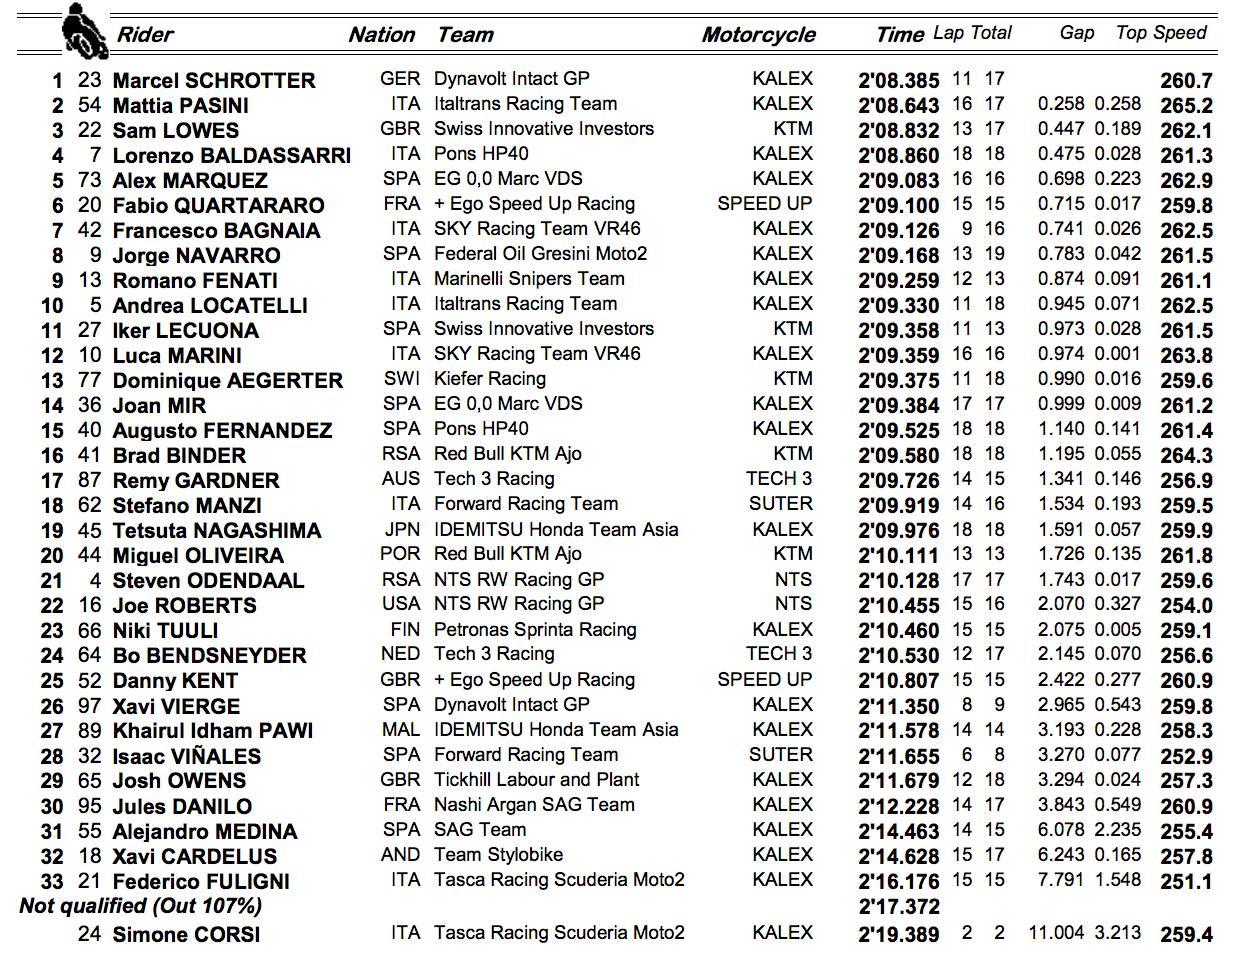 Moto2 FP1 timings